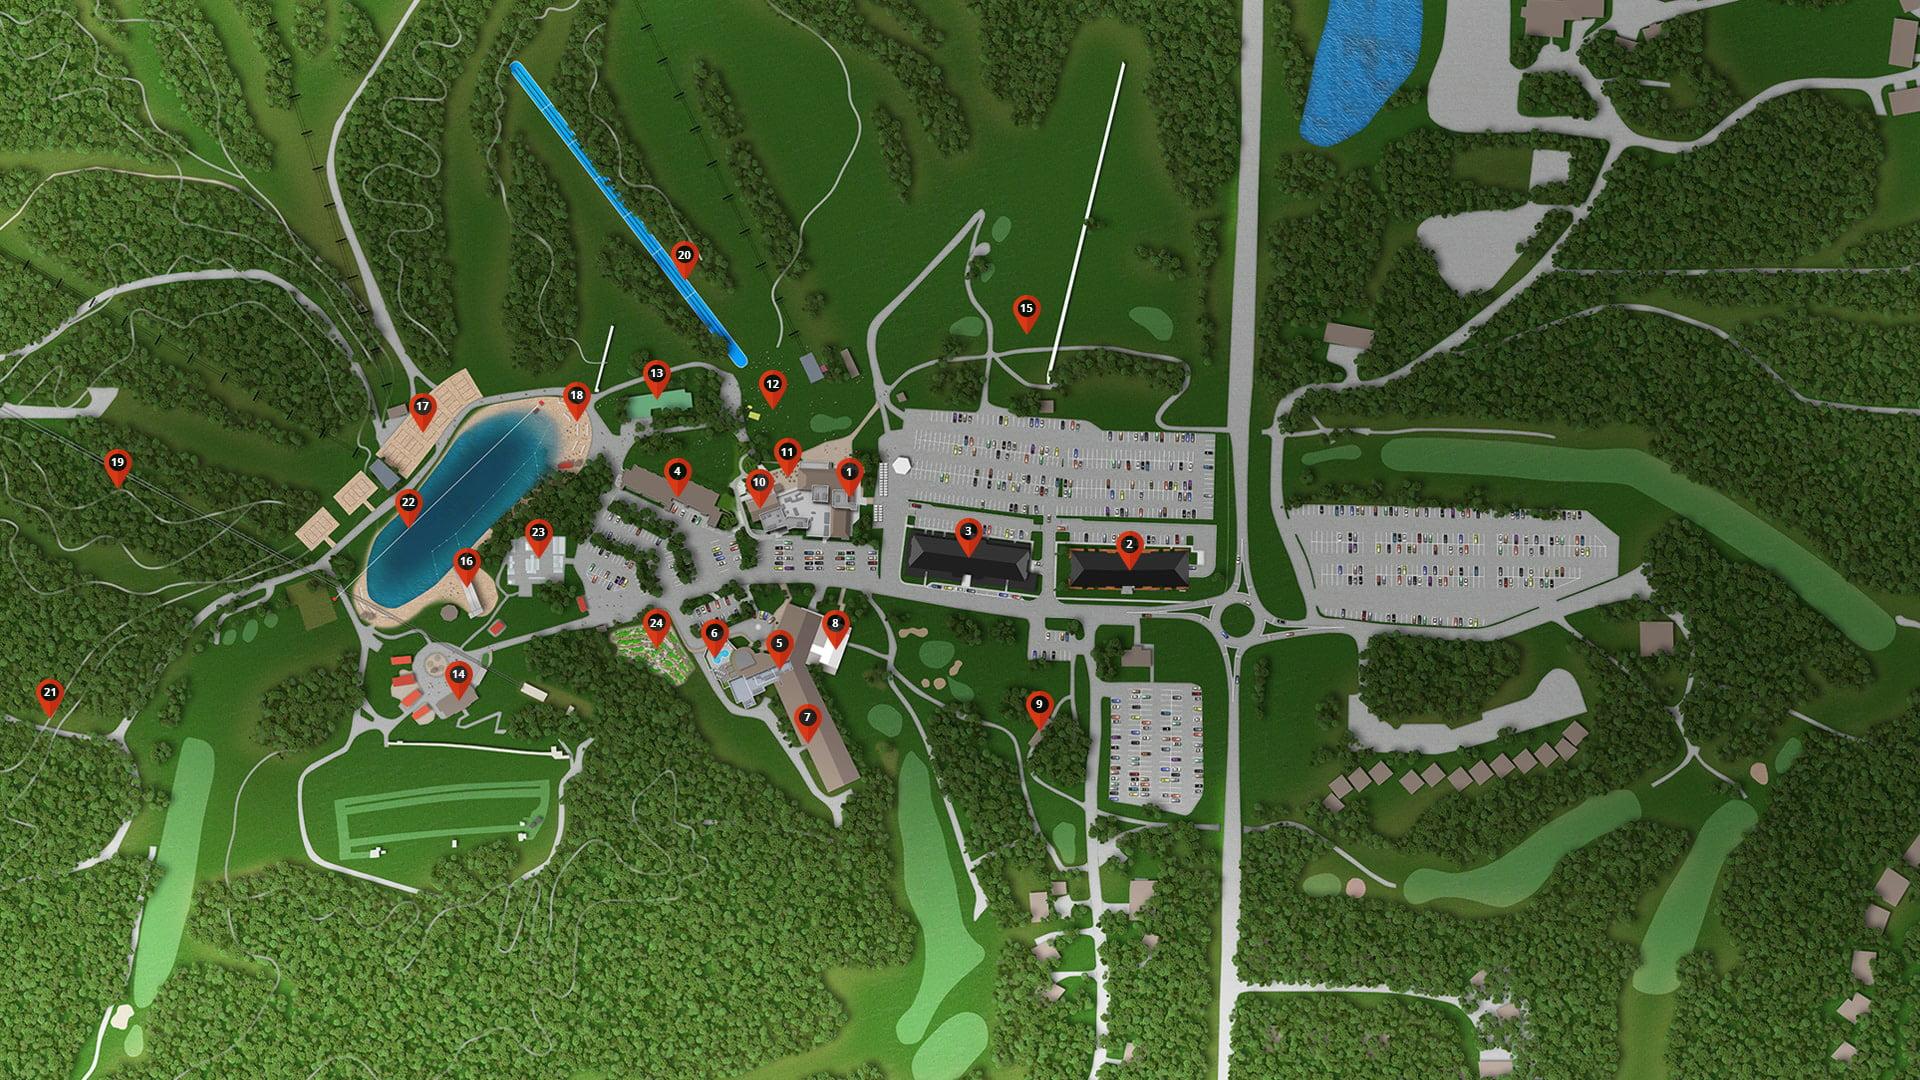 Horseshoe Resort Residences Amenities Map Image